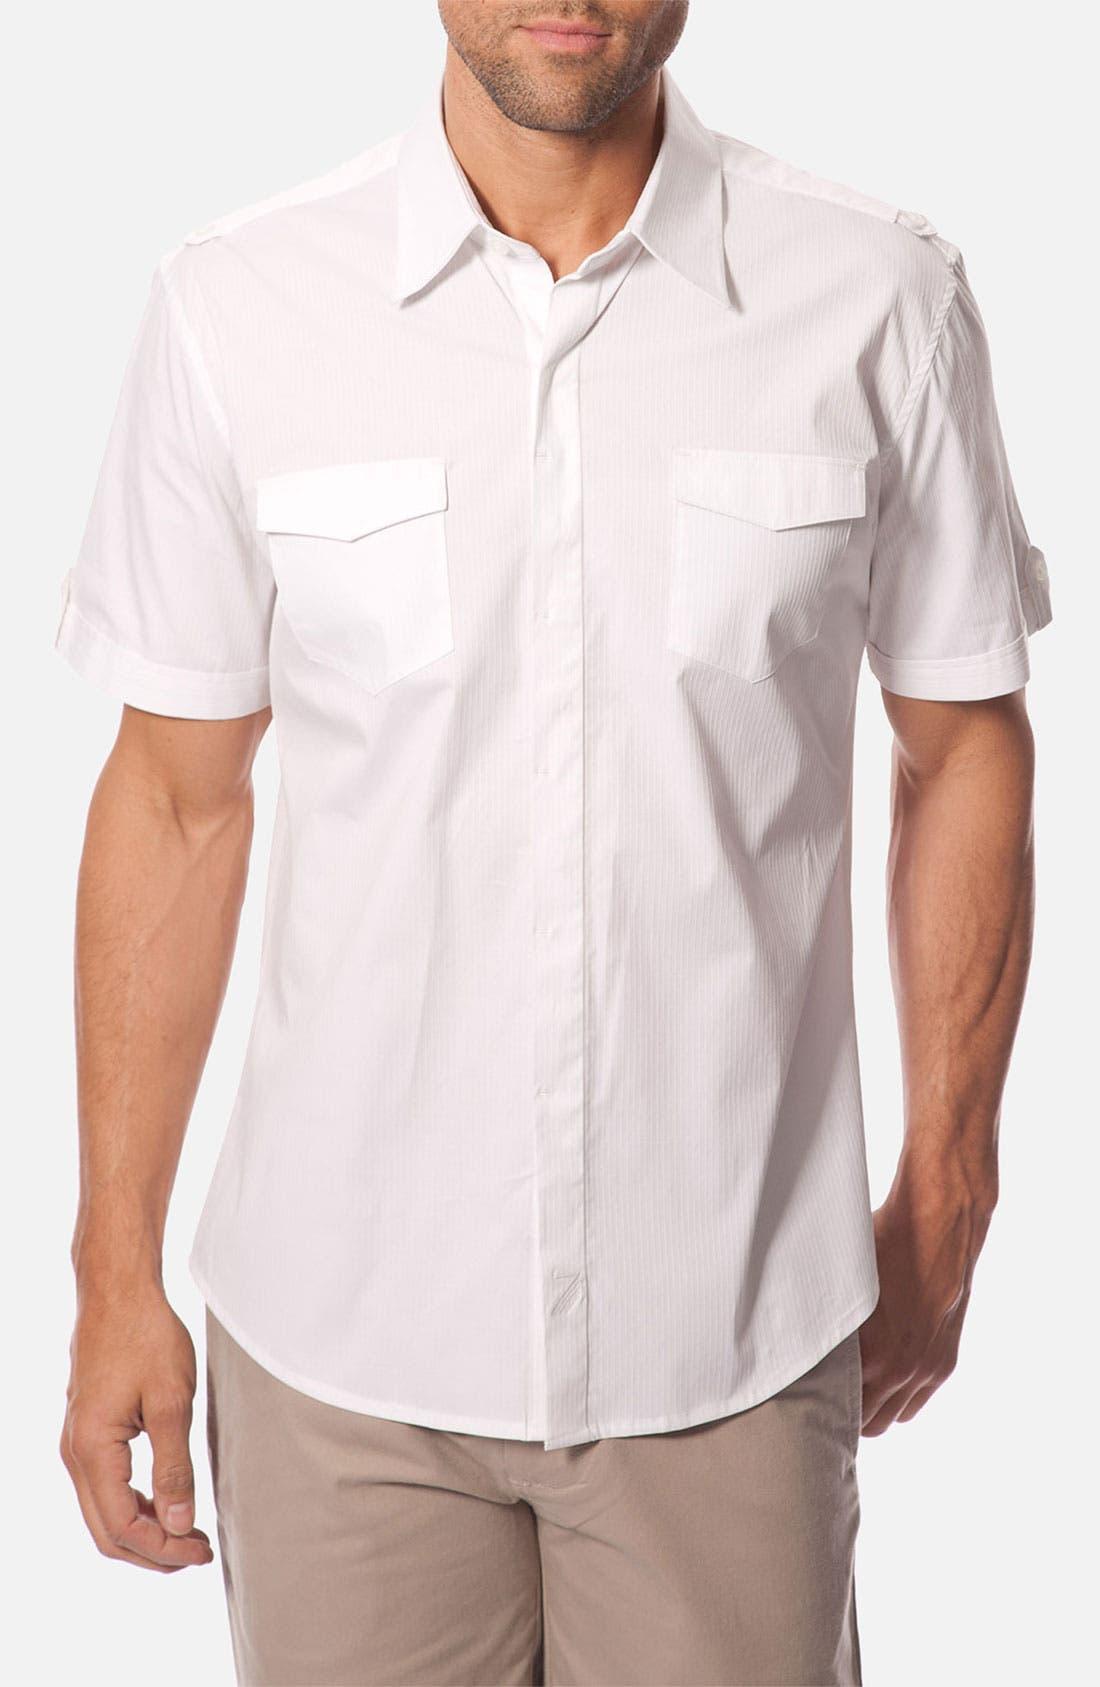 Main Image - 7 Diamonds 'Body & Soul' Tonal Stripe Woven Short Sleeve Shirt